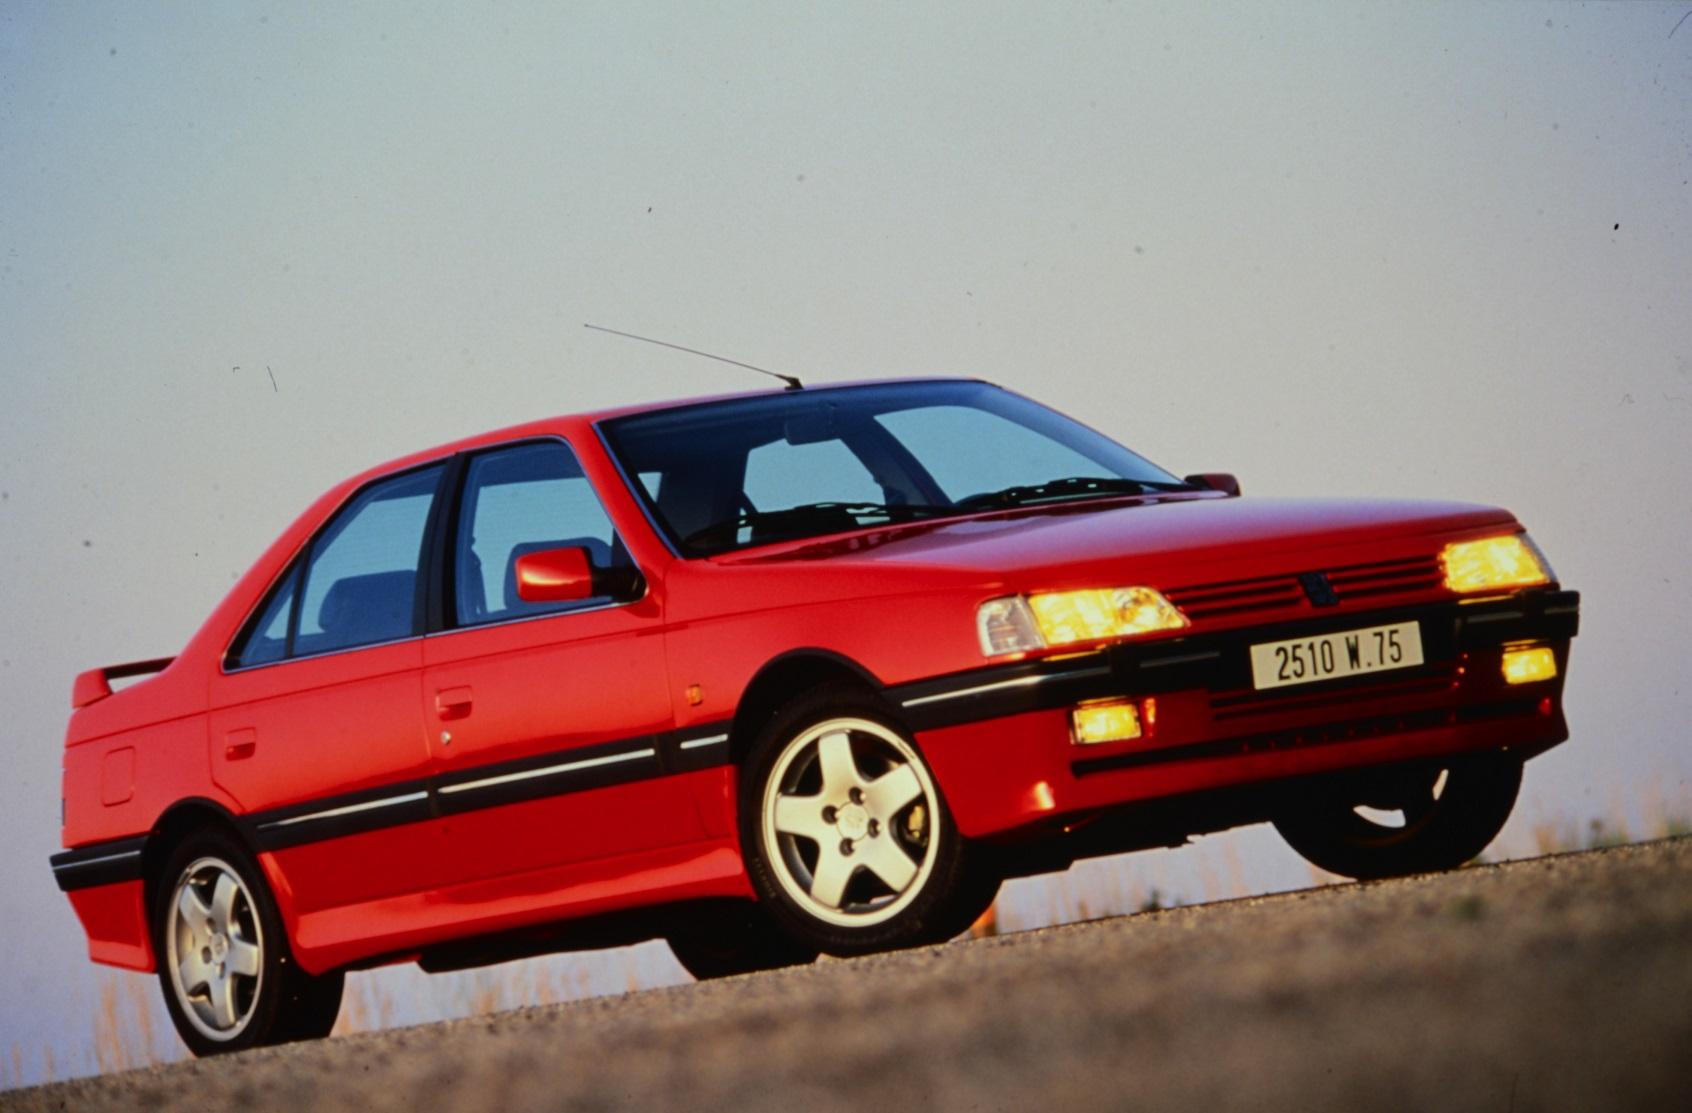 Peugeot 405 T16 як прообраз 508 Peugeot Sport Engineered